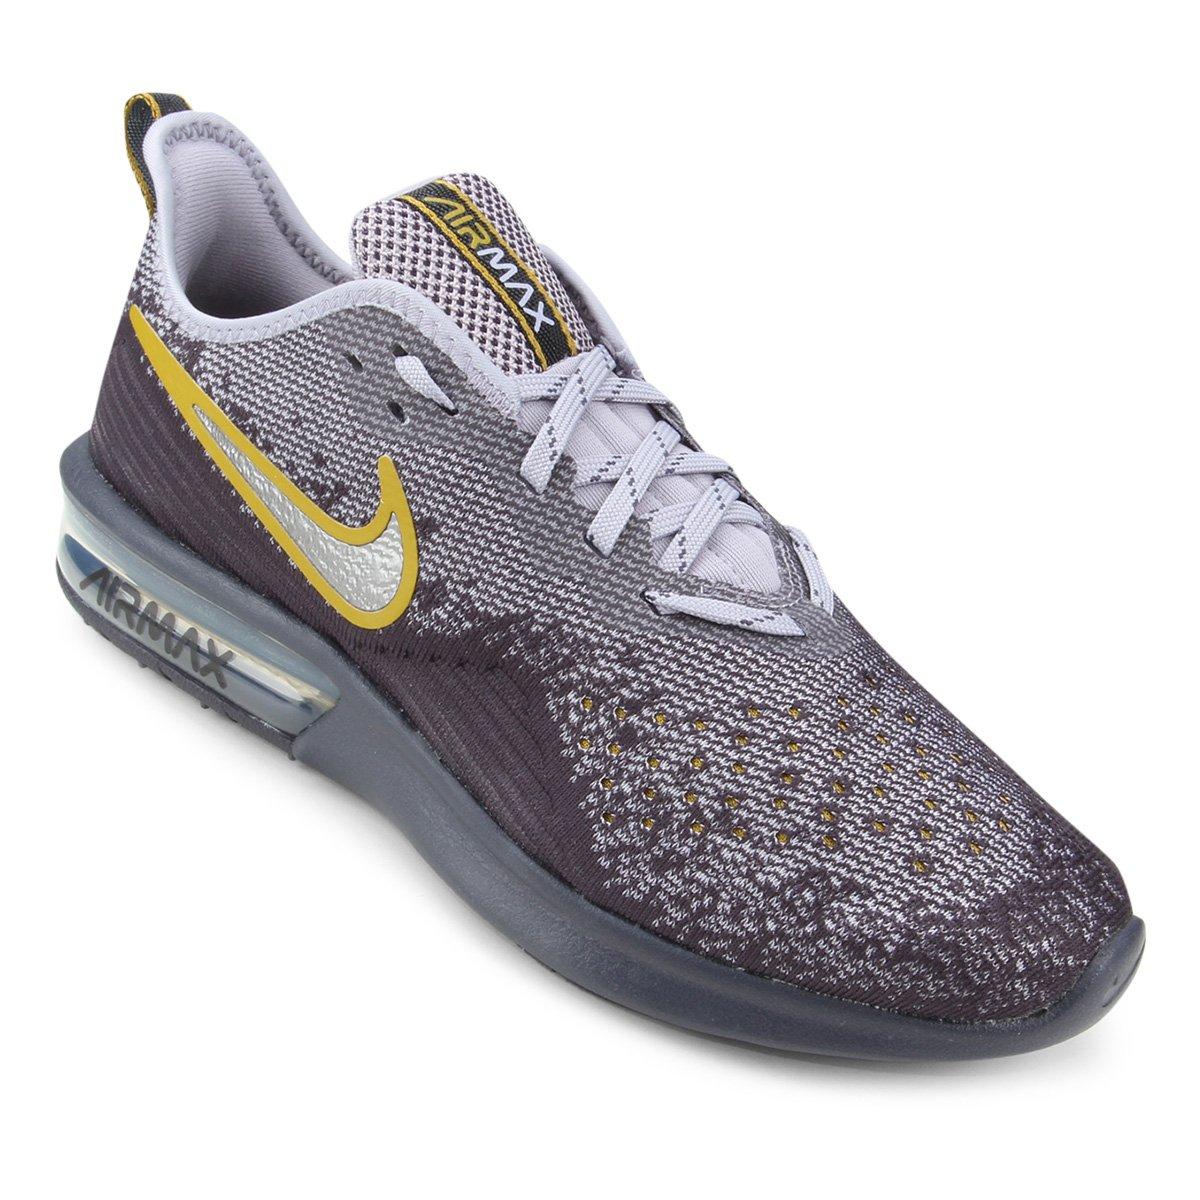 0c72606a7 Tênis Nike Air Max Sequent 4 Masculino - Cinza e Roxo | Shop Timão